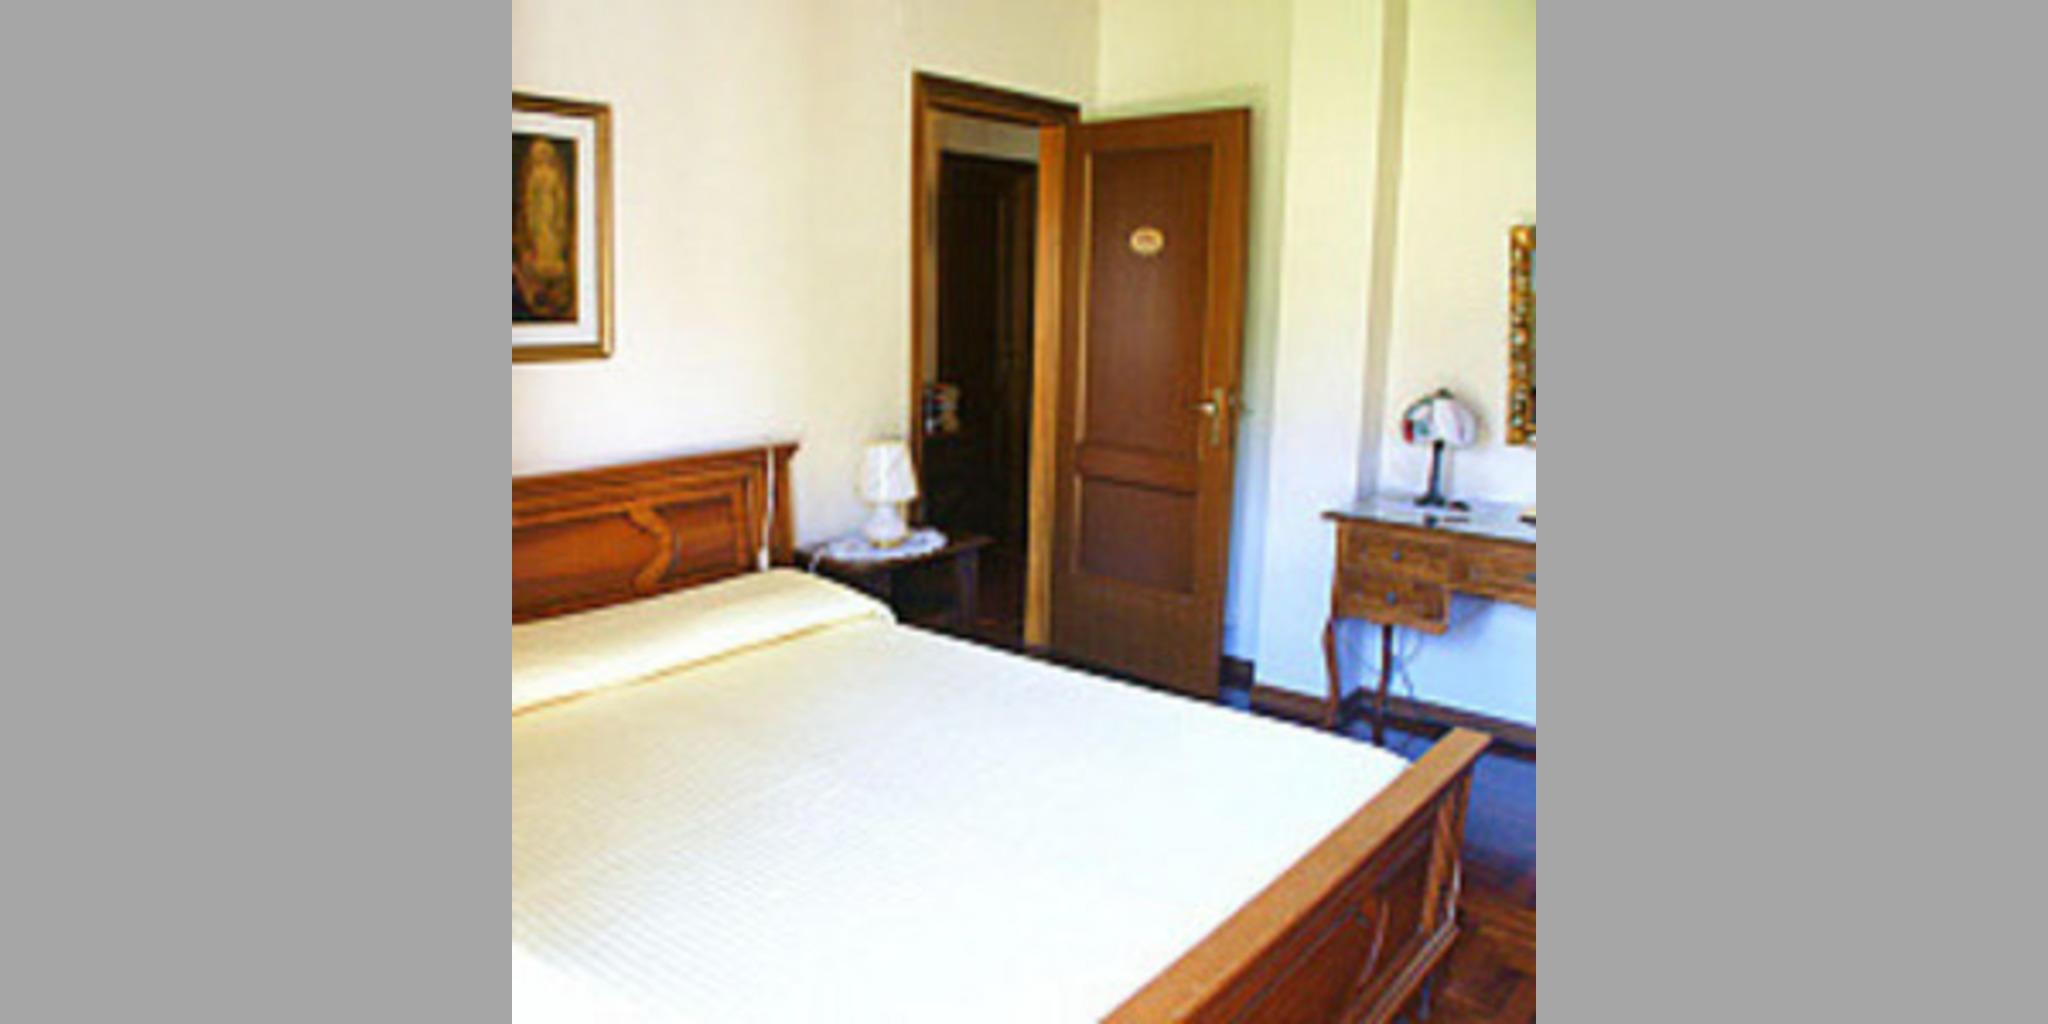 Bed & Breakfast Pescara - Colli Innamorati